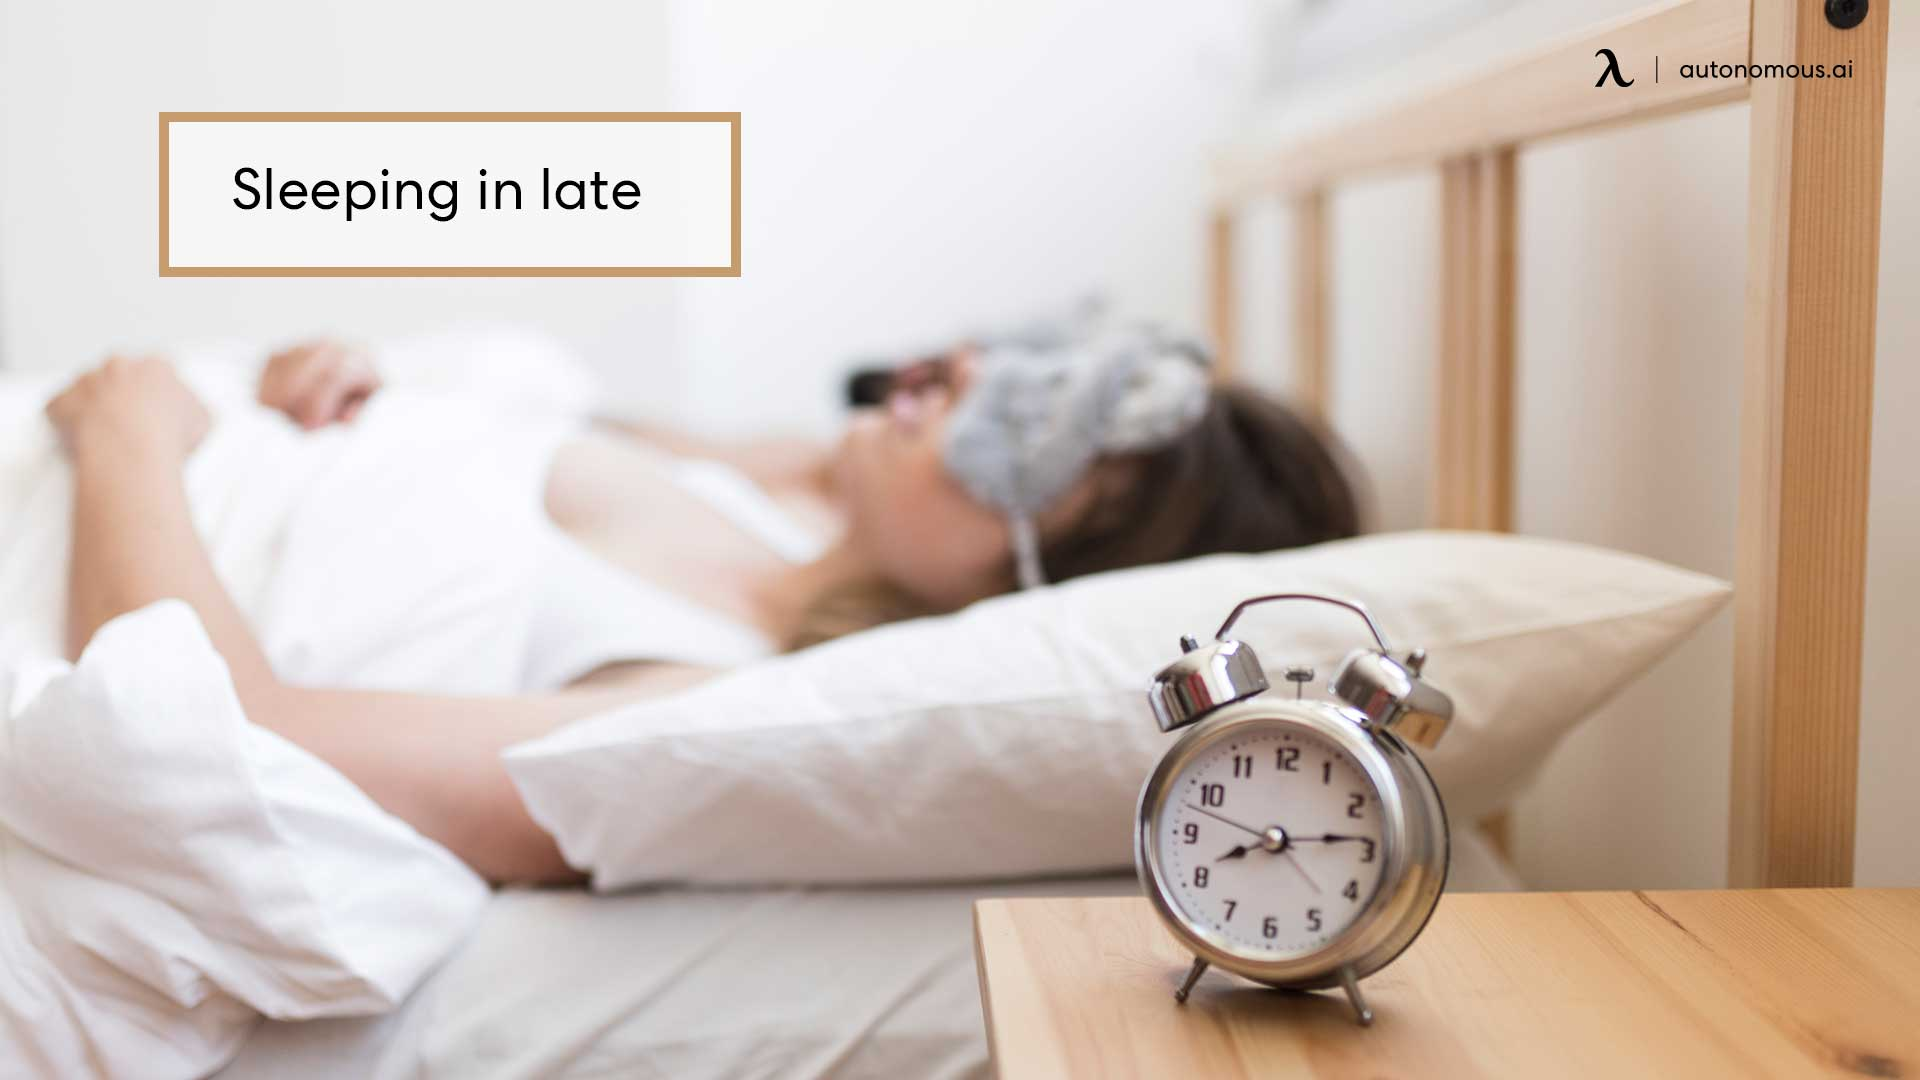 Photo of bad habit sleeping in late